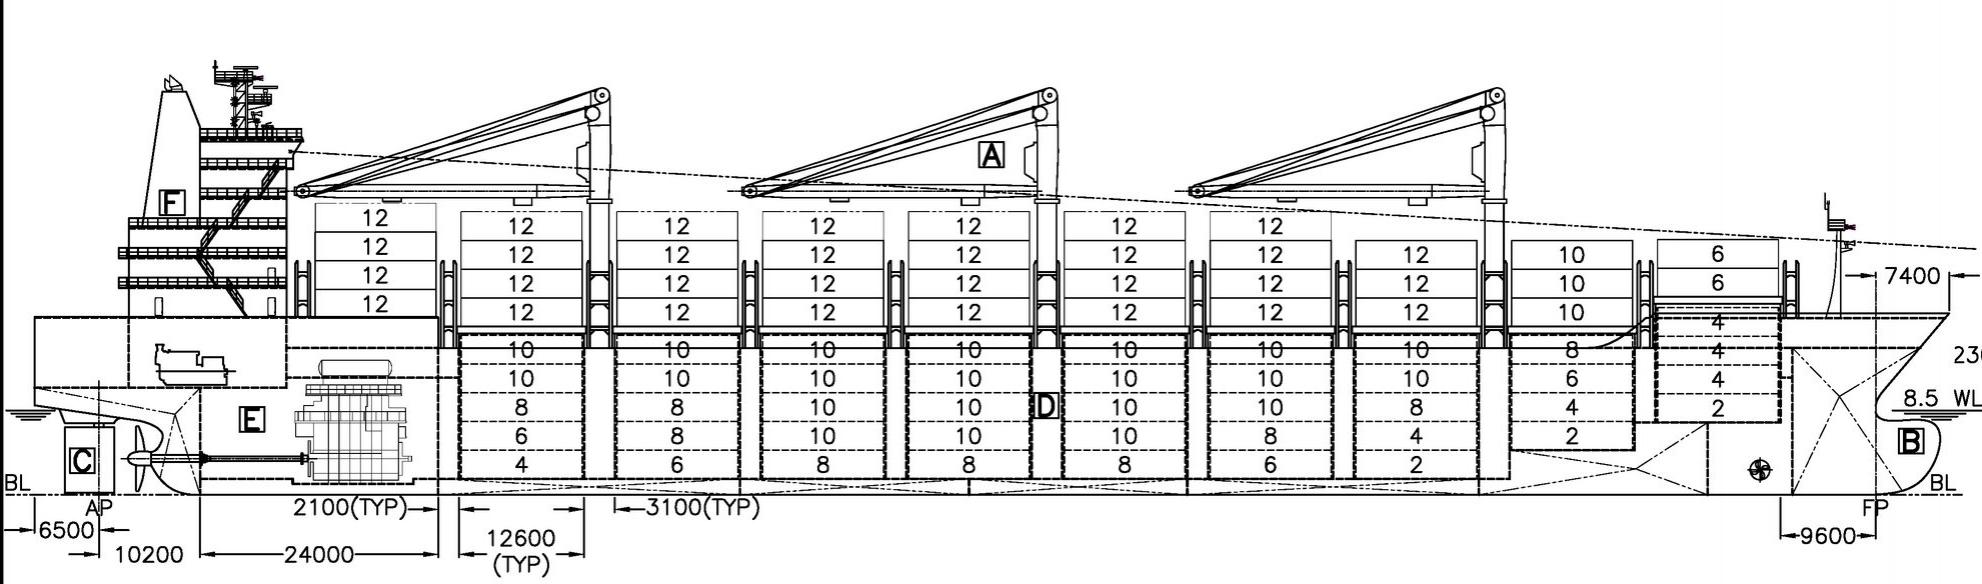 General Plan-3.jpg